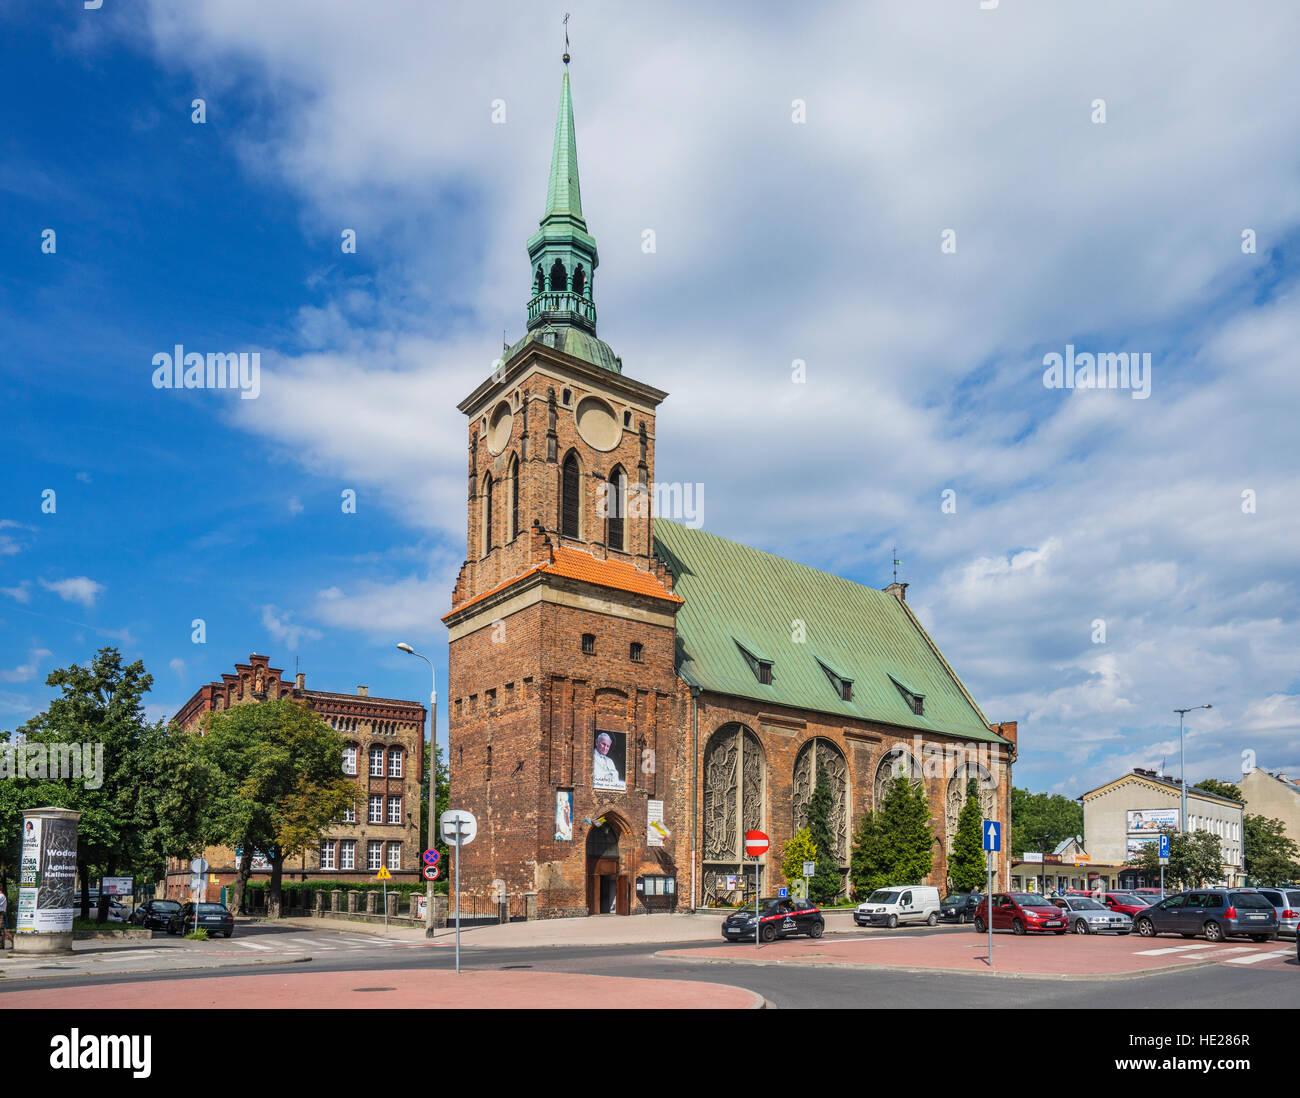 Poland, Pomerania, Gdansk (Danzig), St. Barbara Church, Langgarten - Stock Image